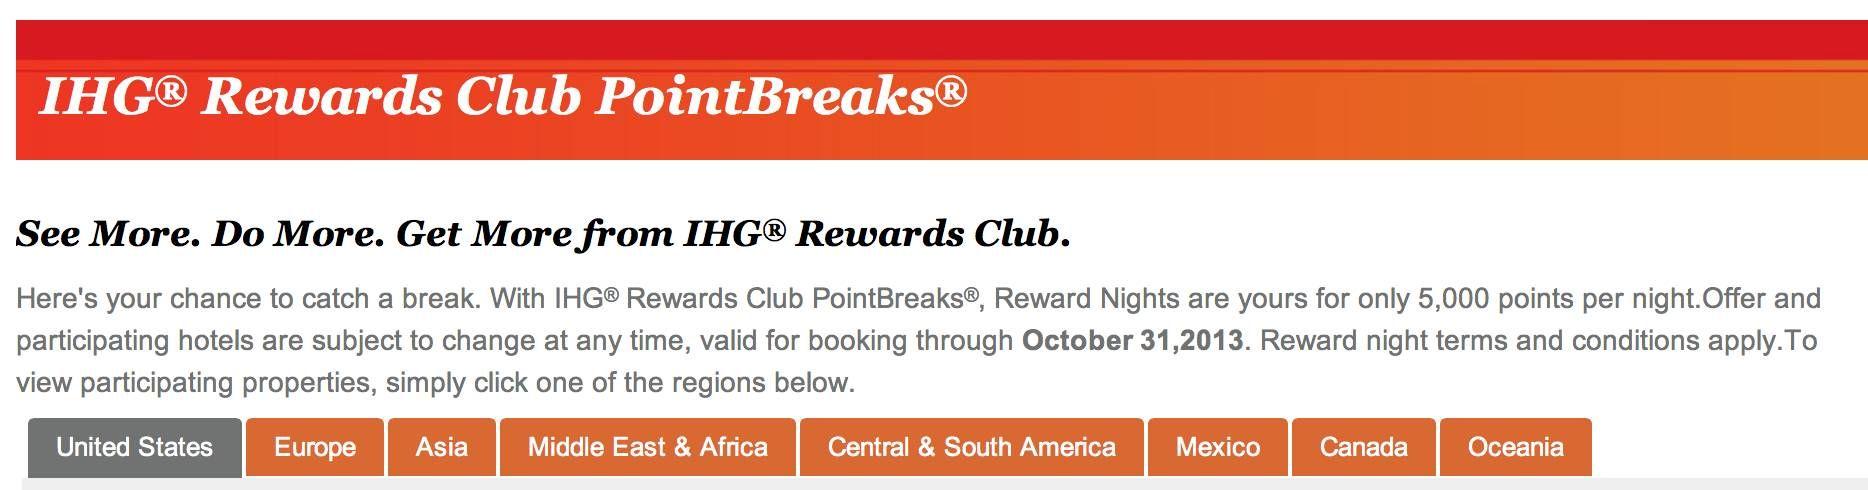 ihg points break